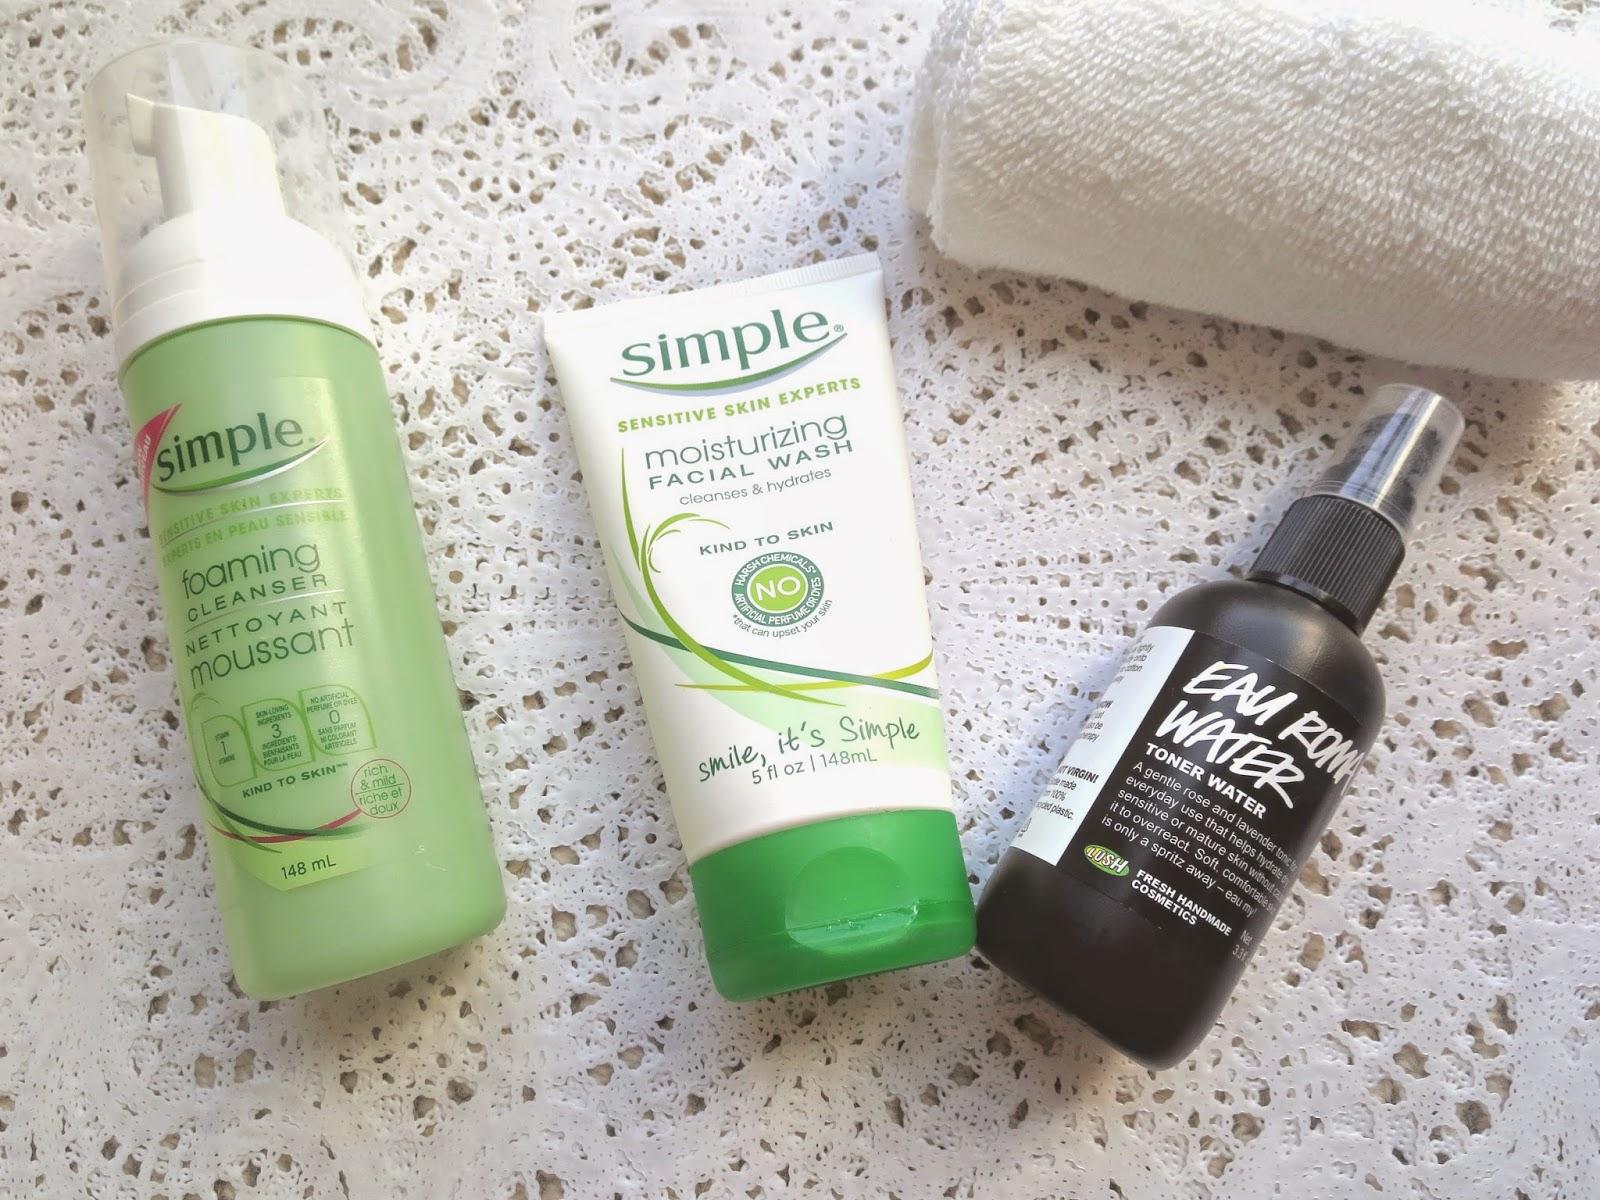 a picture Sensitive skin cleansers & Toner ; Simple Foaming Cleanser, Simple Moisturizing Facial Wash, Lush Eau Roma Toner